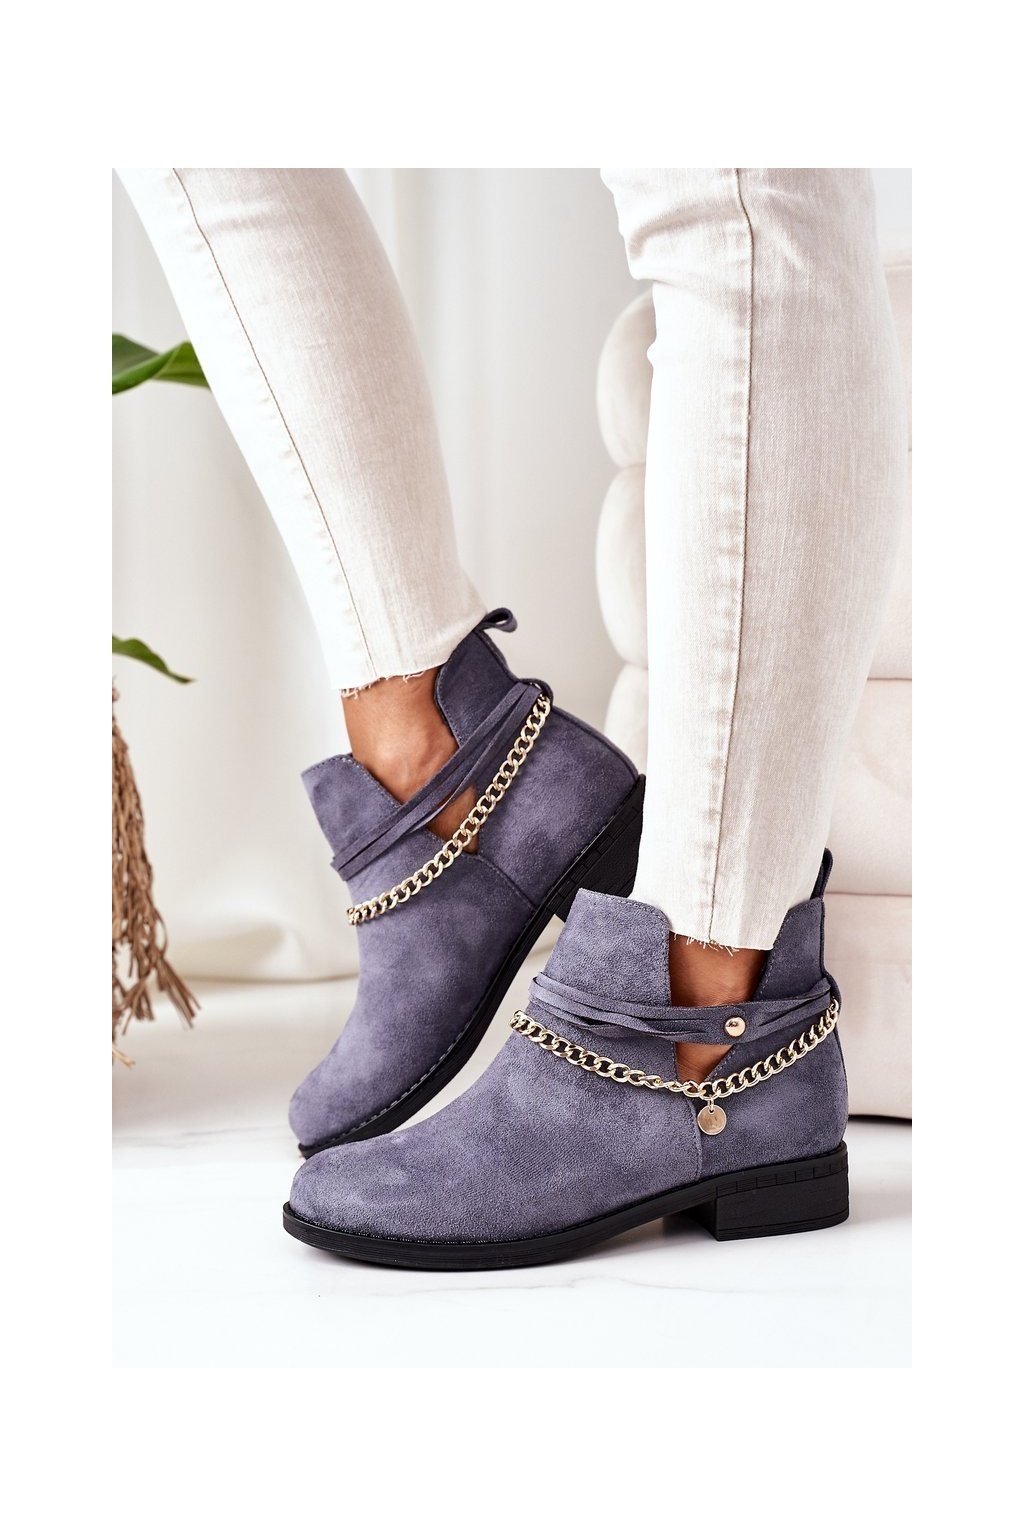 Členkové topánky na podpätku farba modrá kód obuvi ST-71 BLUE